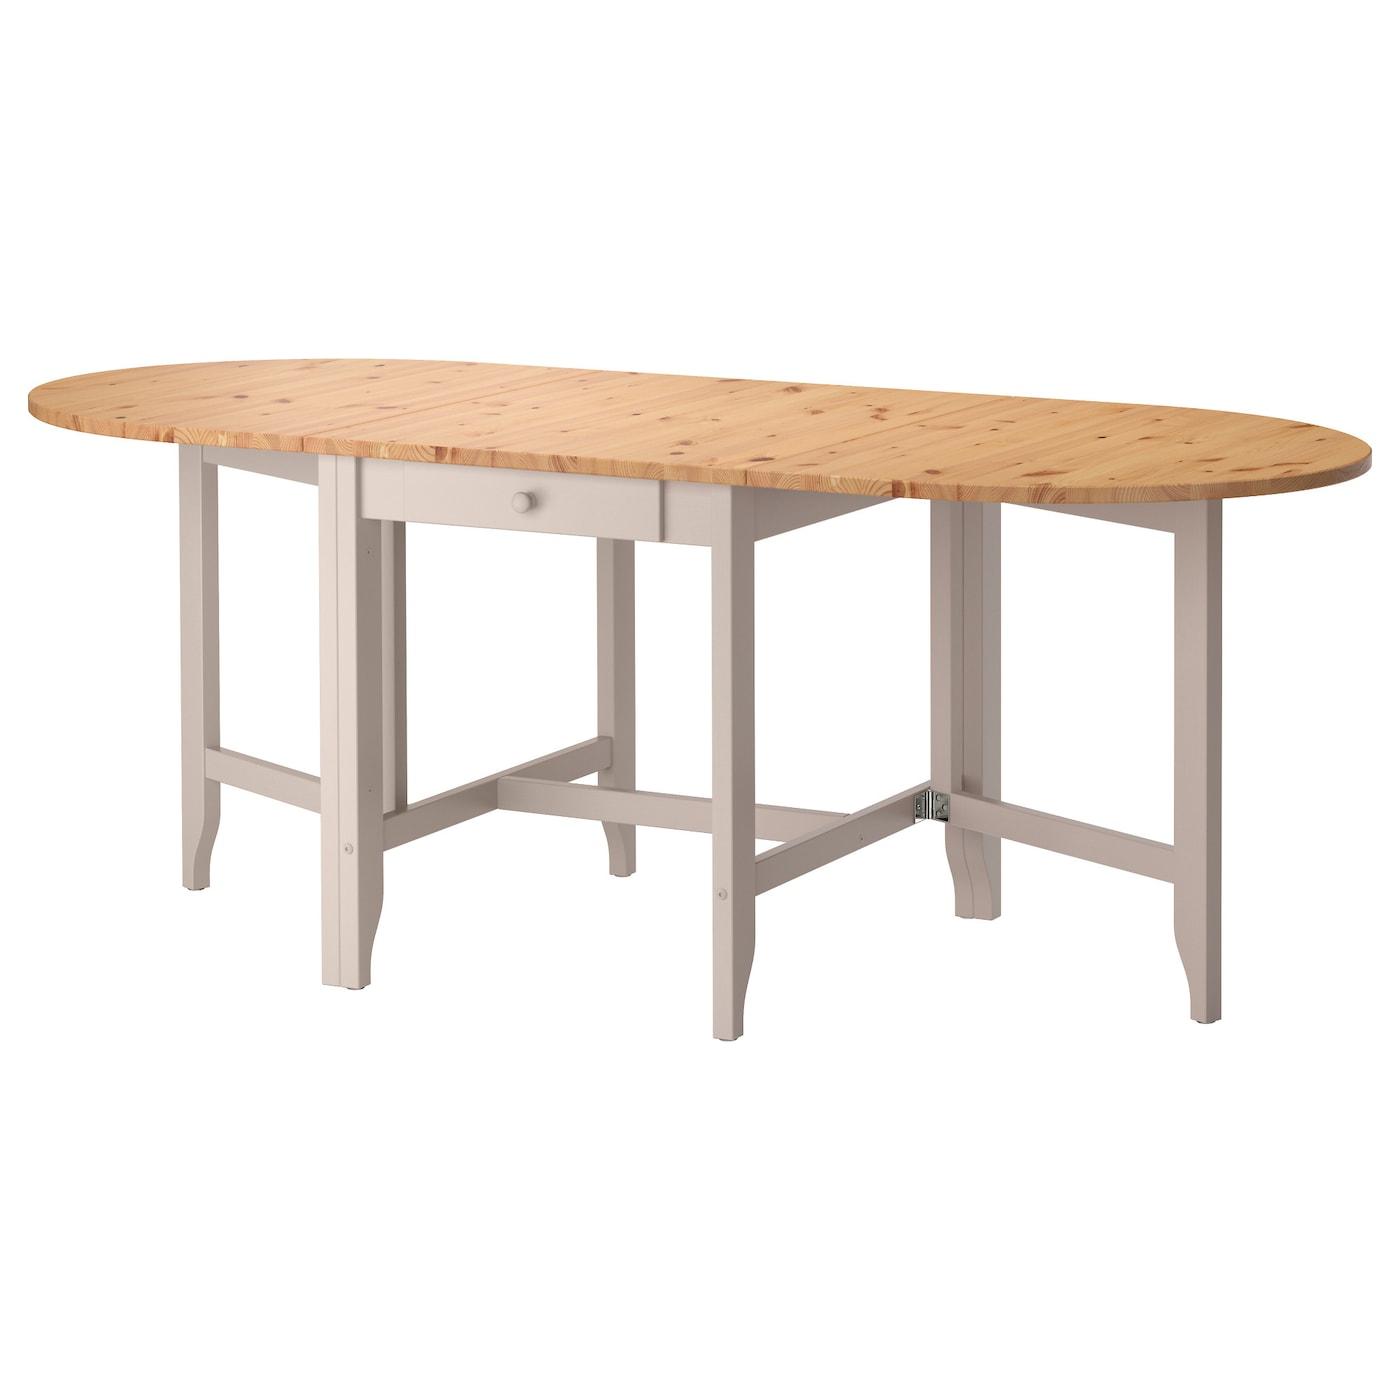 IKEA Dining Tables | IKEA Ireland - Dublin